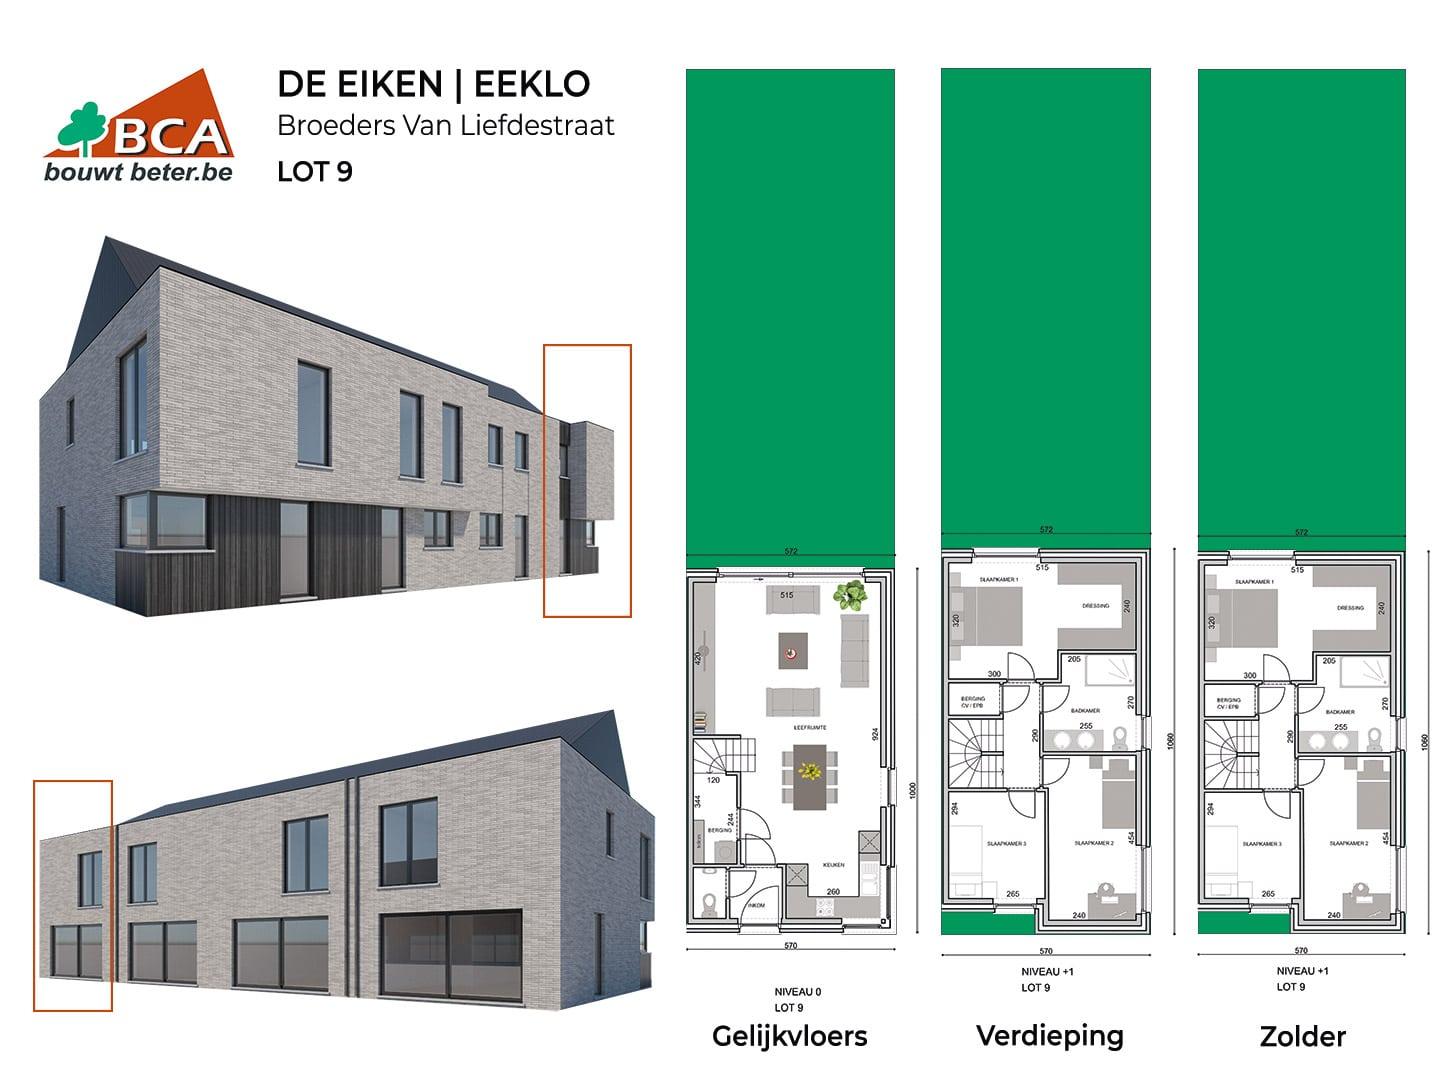 Eeklo-de-eiken-plannen-lot-9